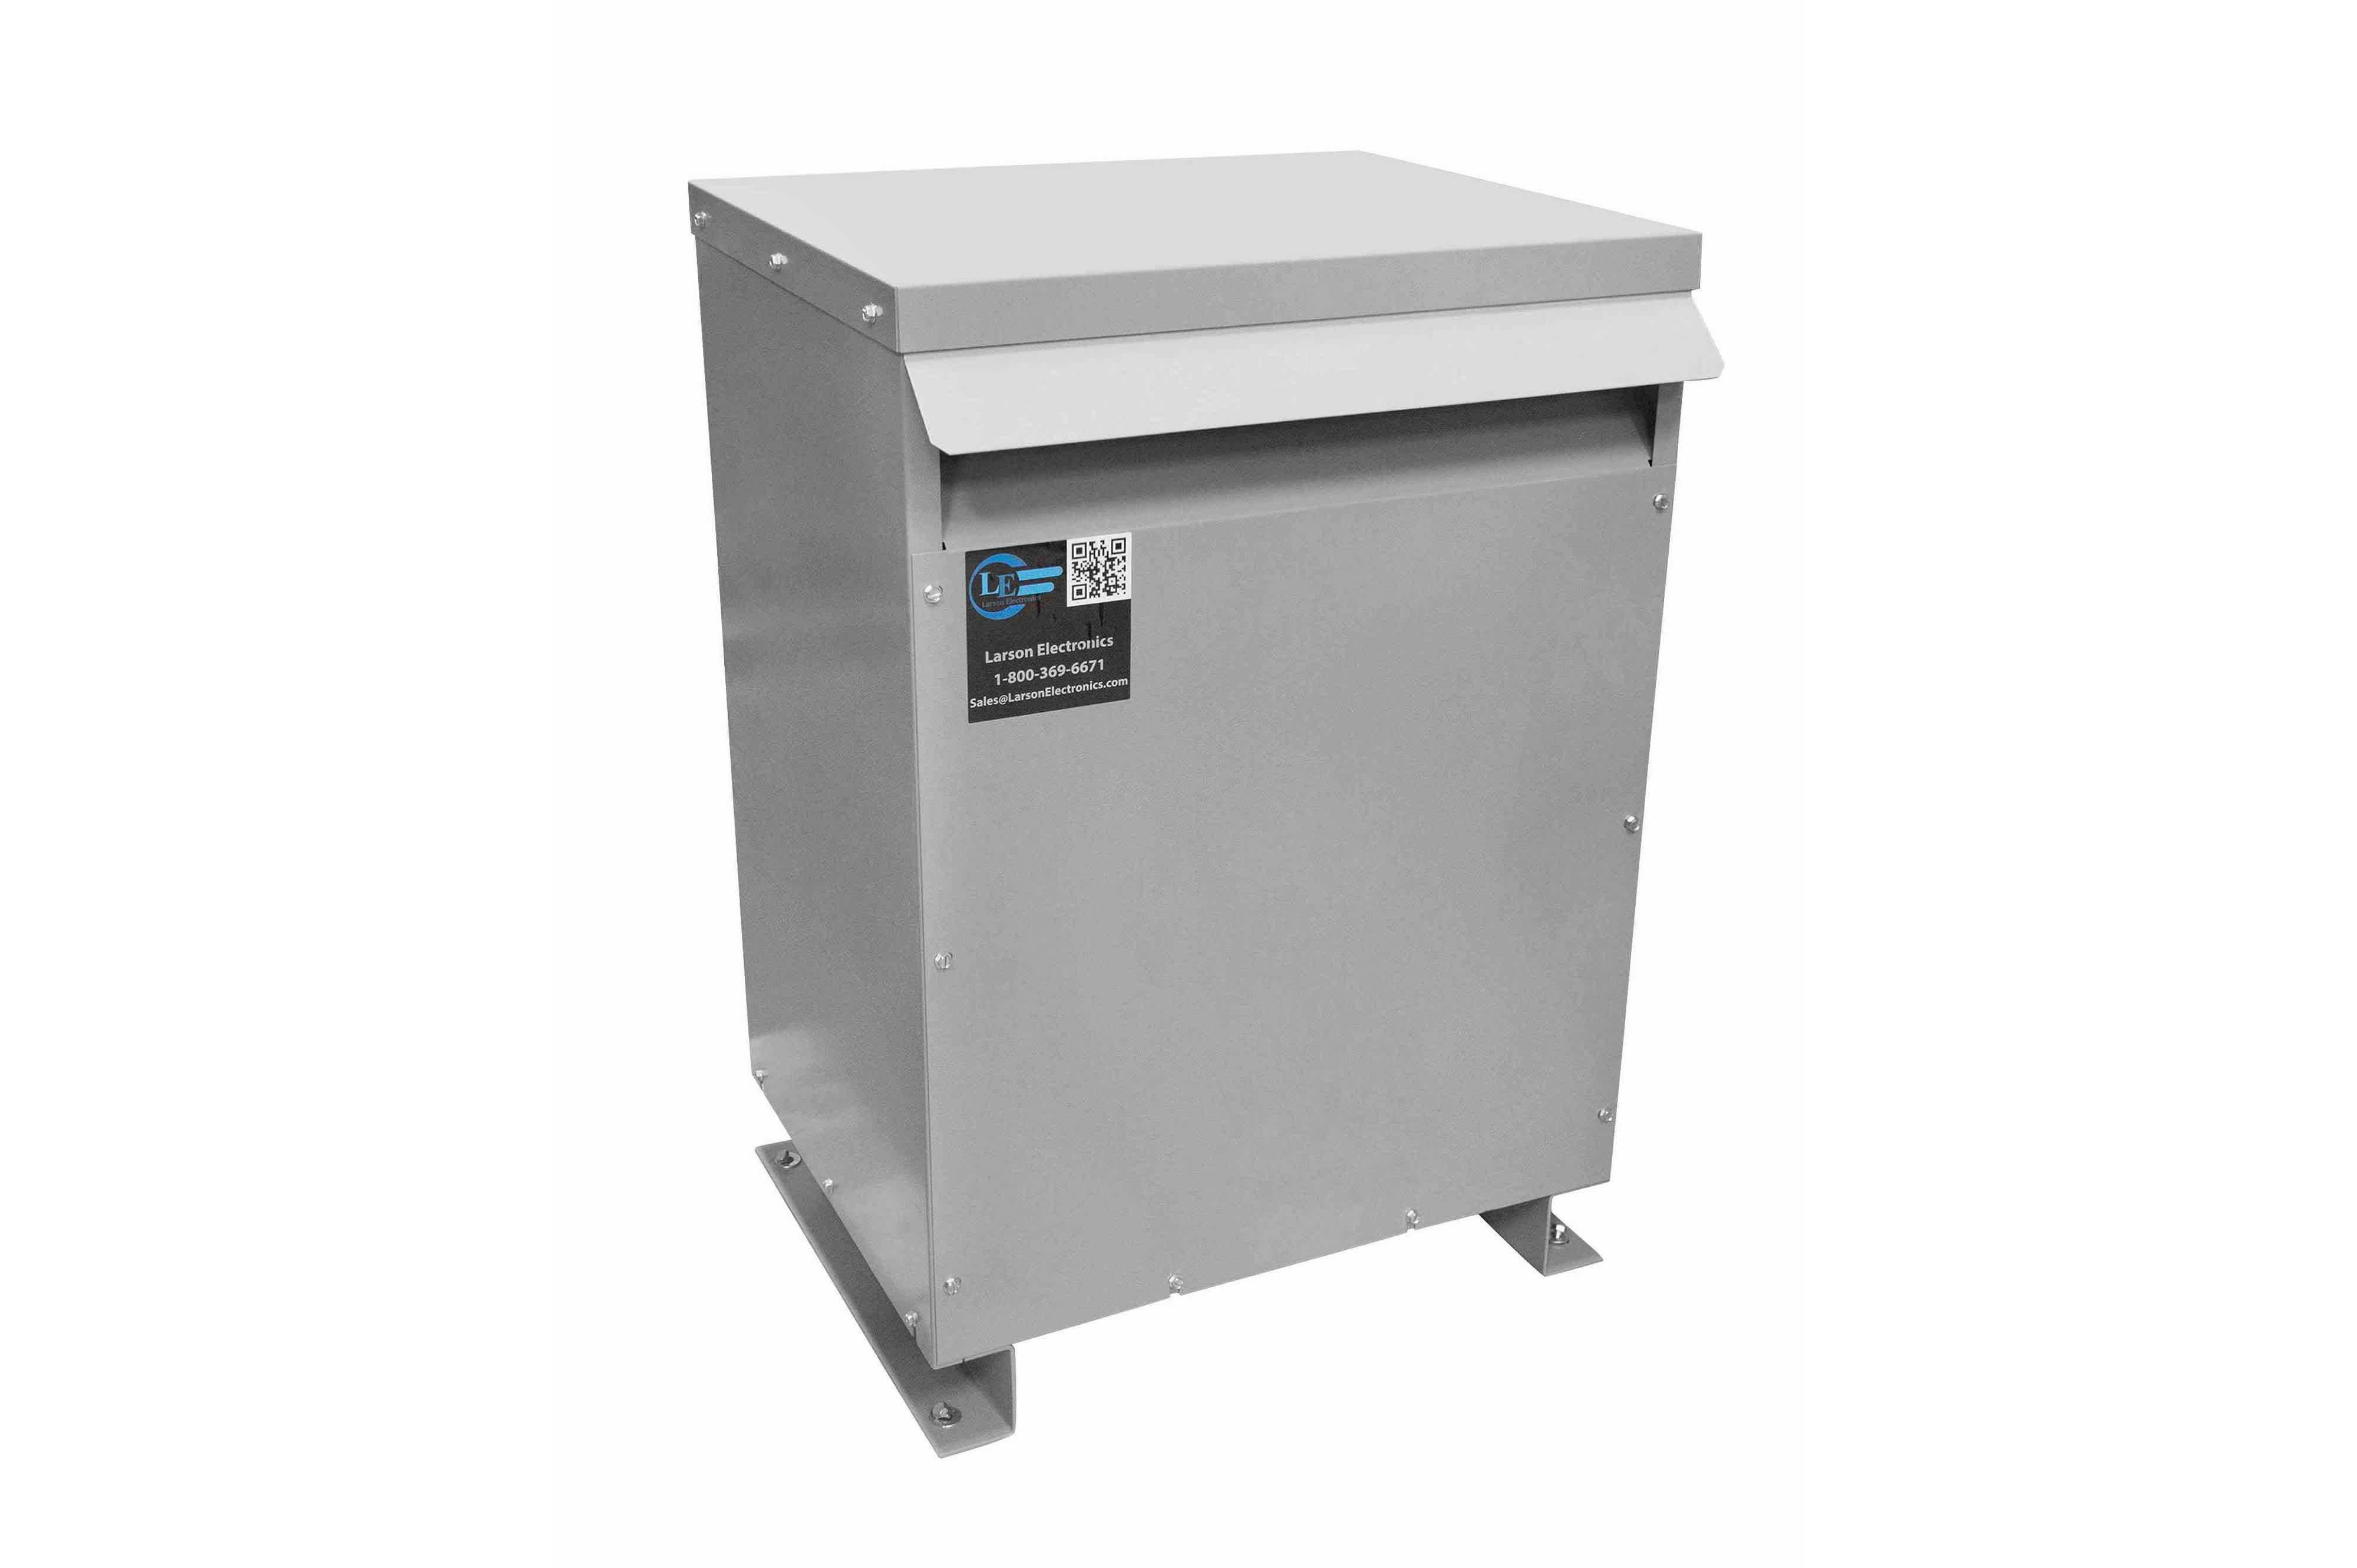 150 kVA 3PH Isolation Transformer, 240V Wye Primary, 380V Delta Secondary, N3R, Ventilated, 60 Hz